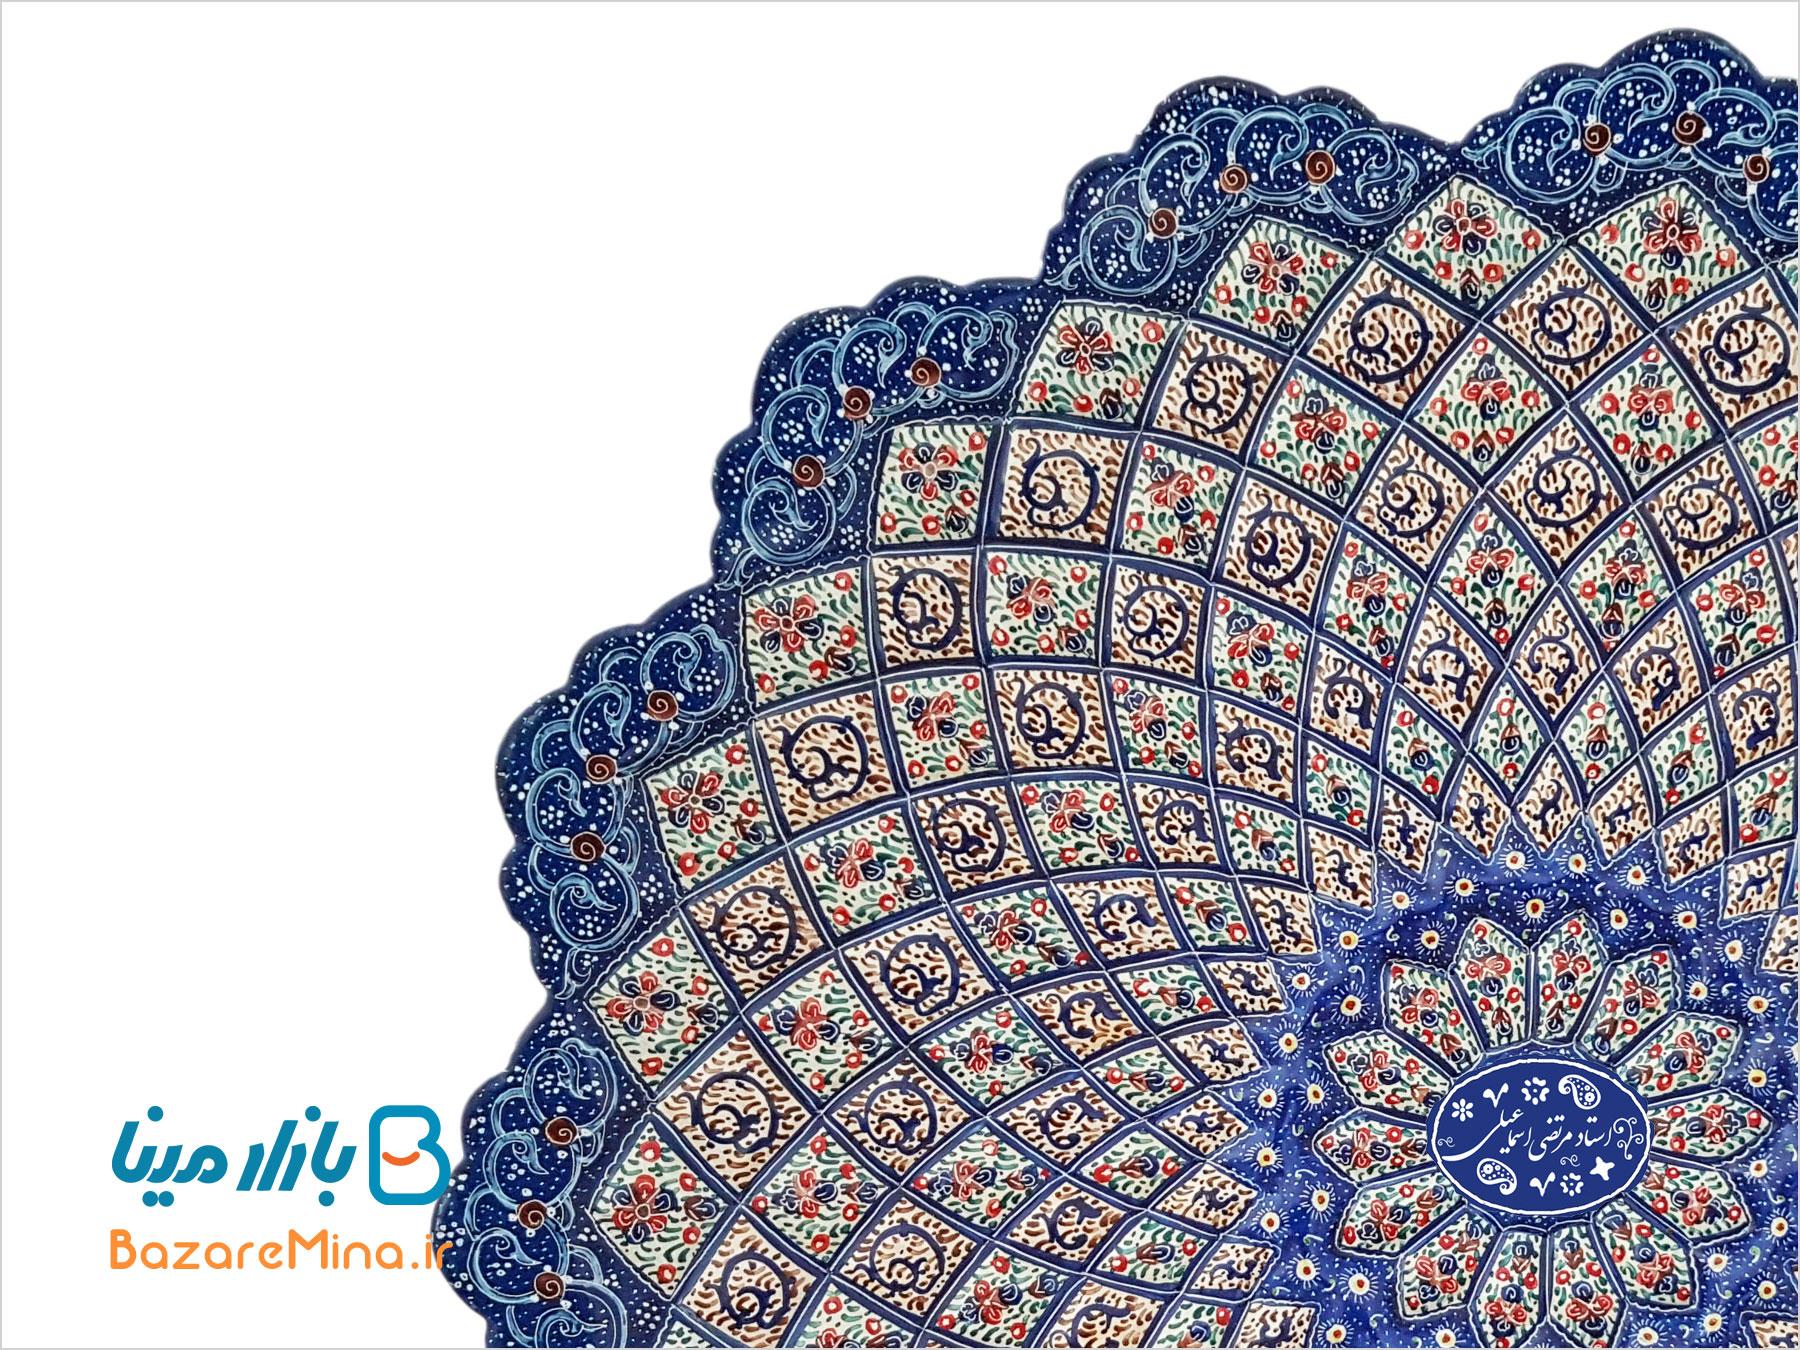 قیمت بشقاب میناکاری اصفهان